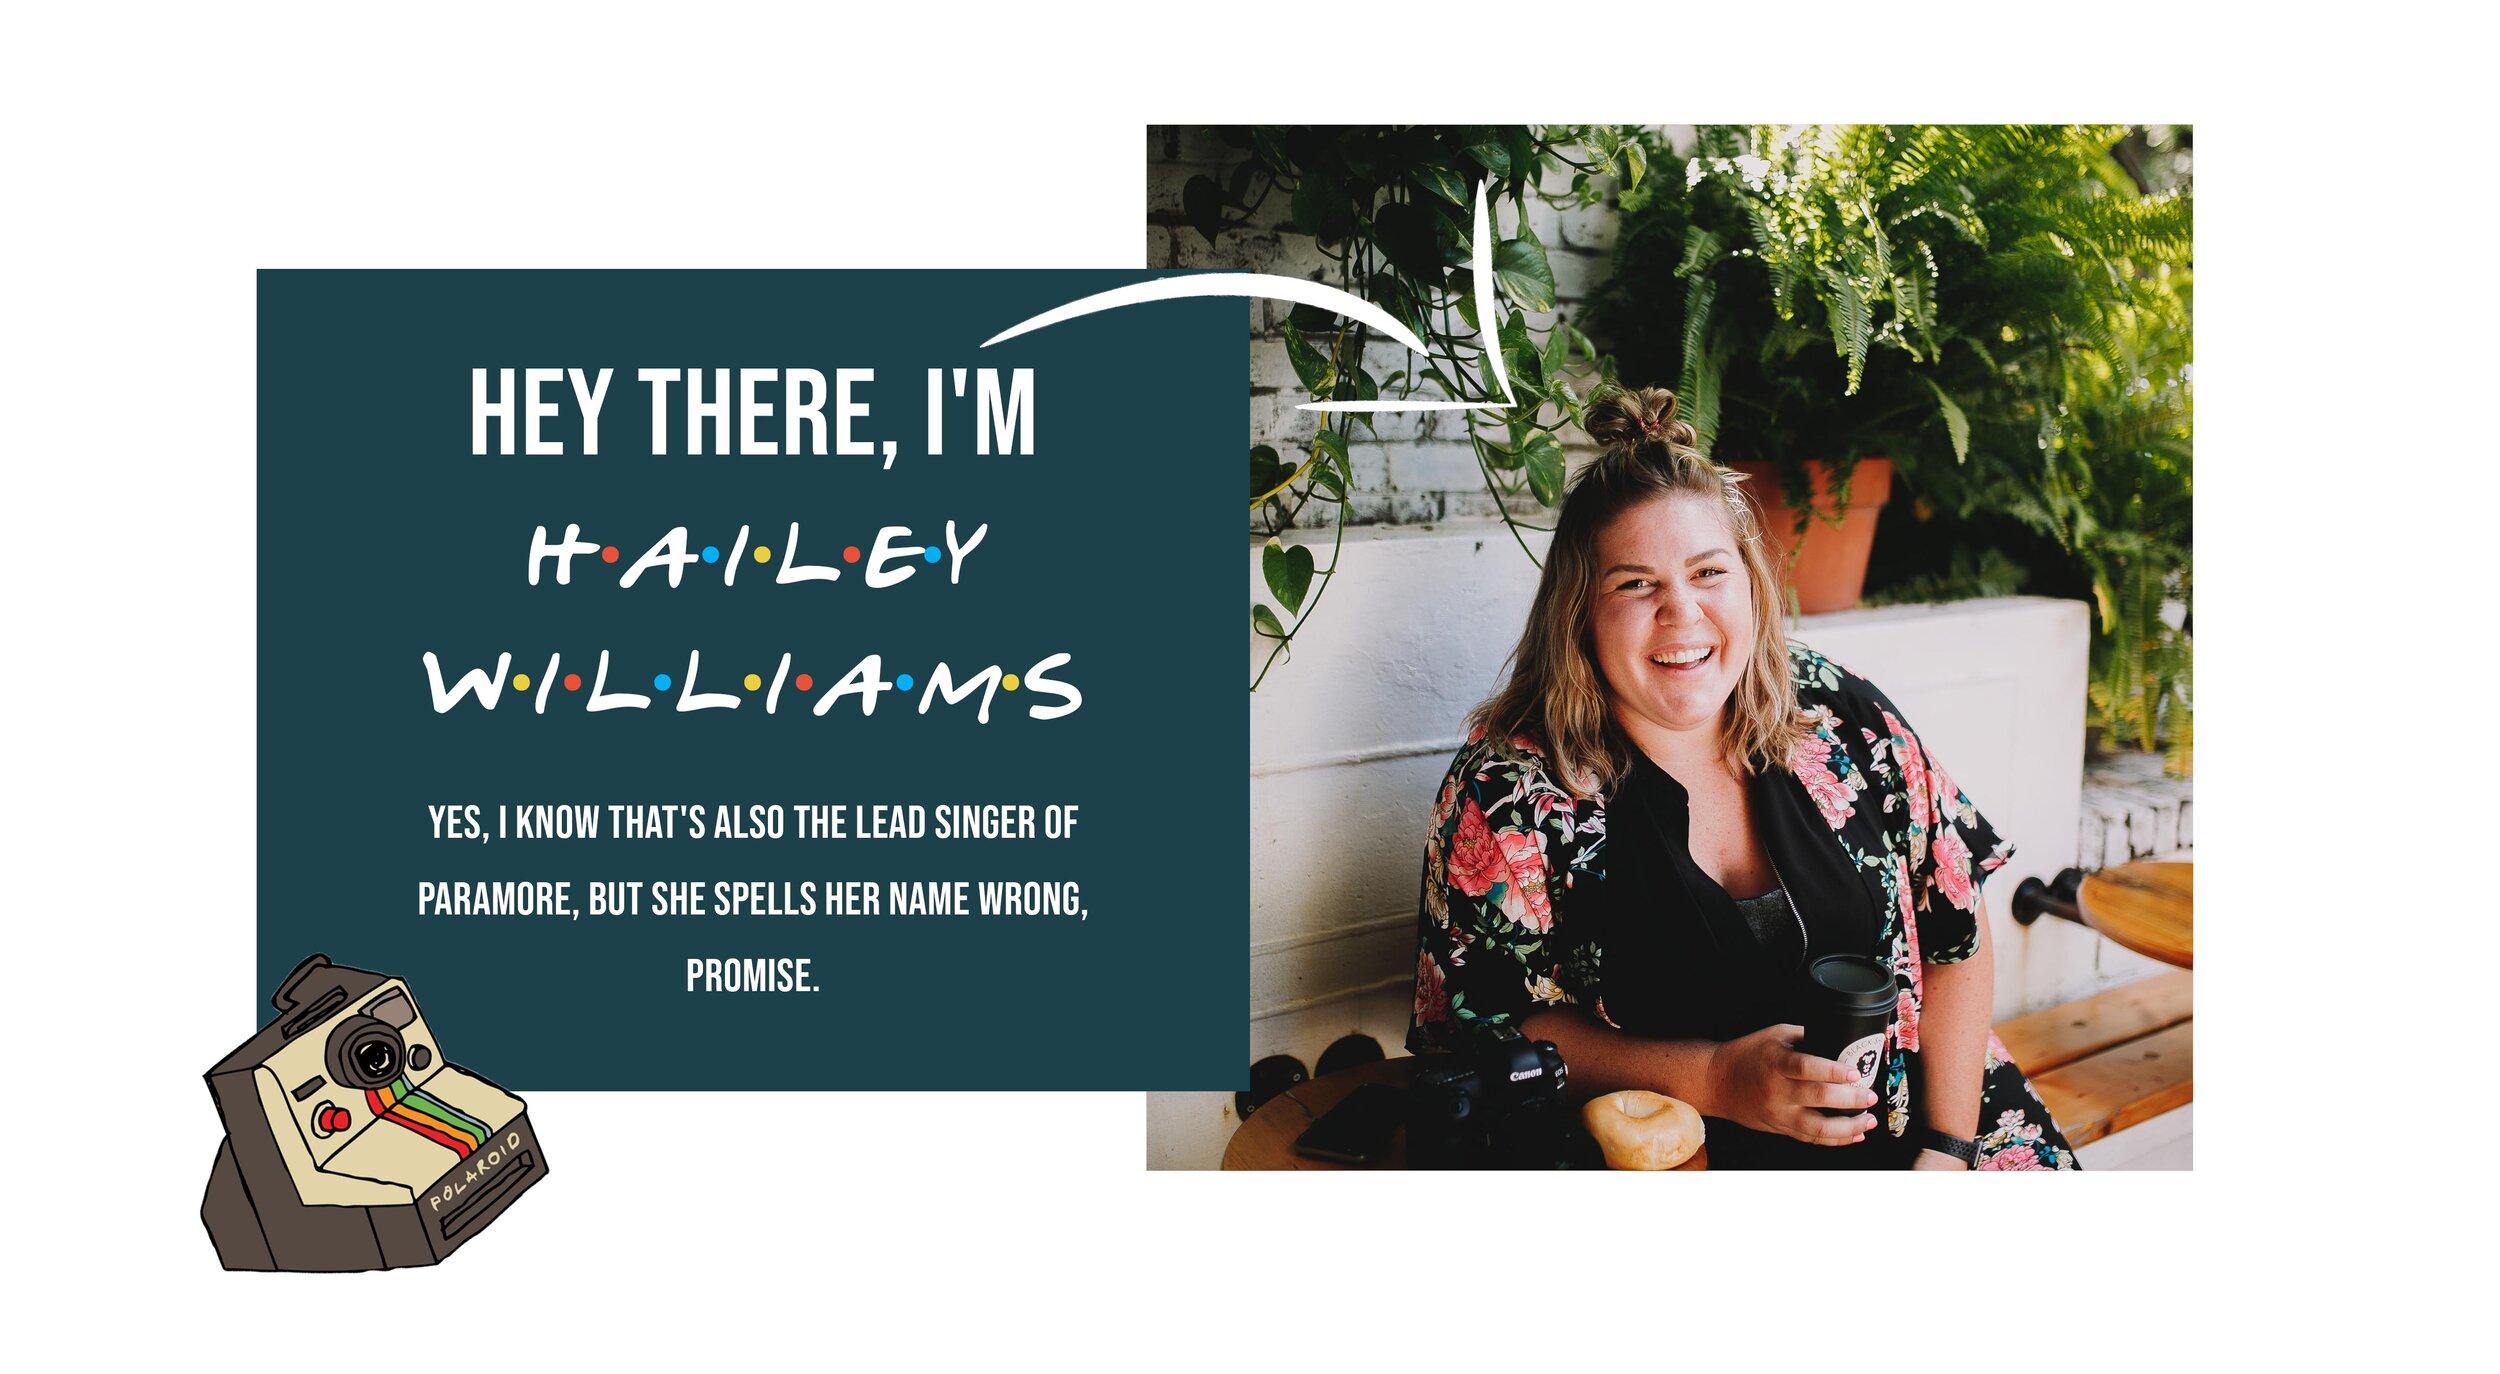 Archer Inspired Photography - Hailey Williams - Long Beach CA SoCal Wedding Photographer About Me Smaller Crop.jpg